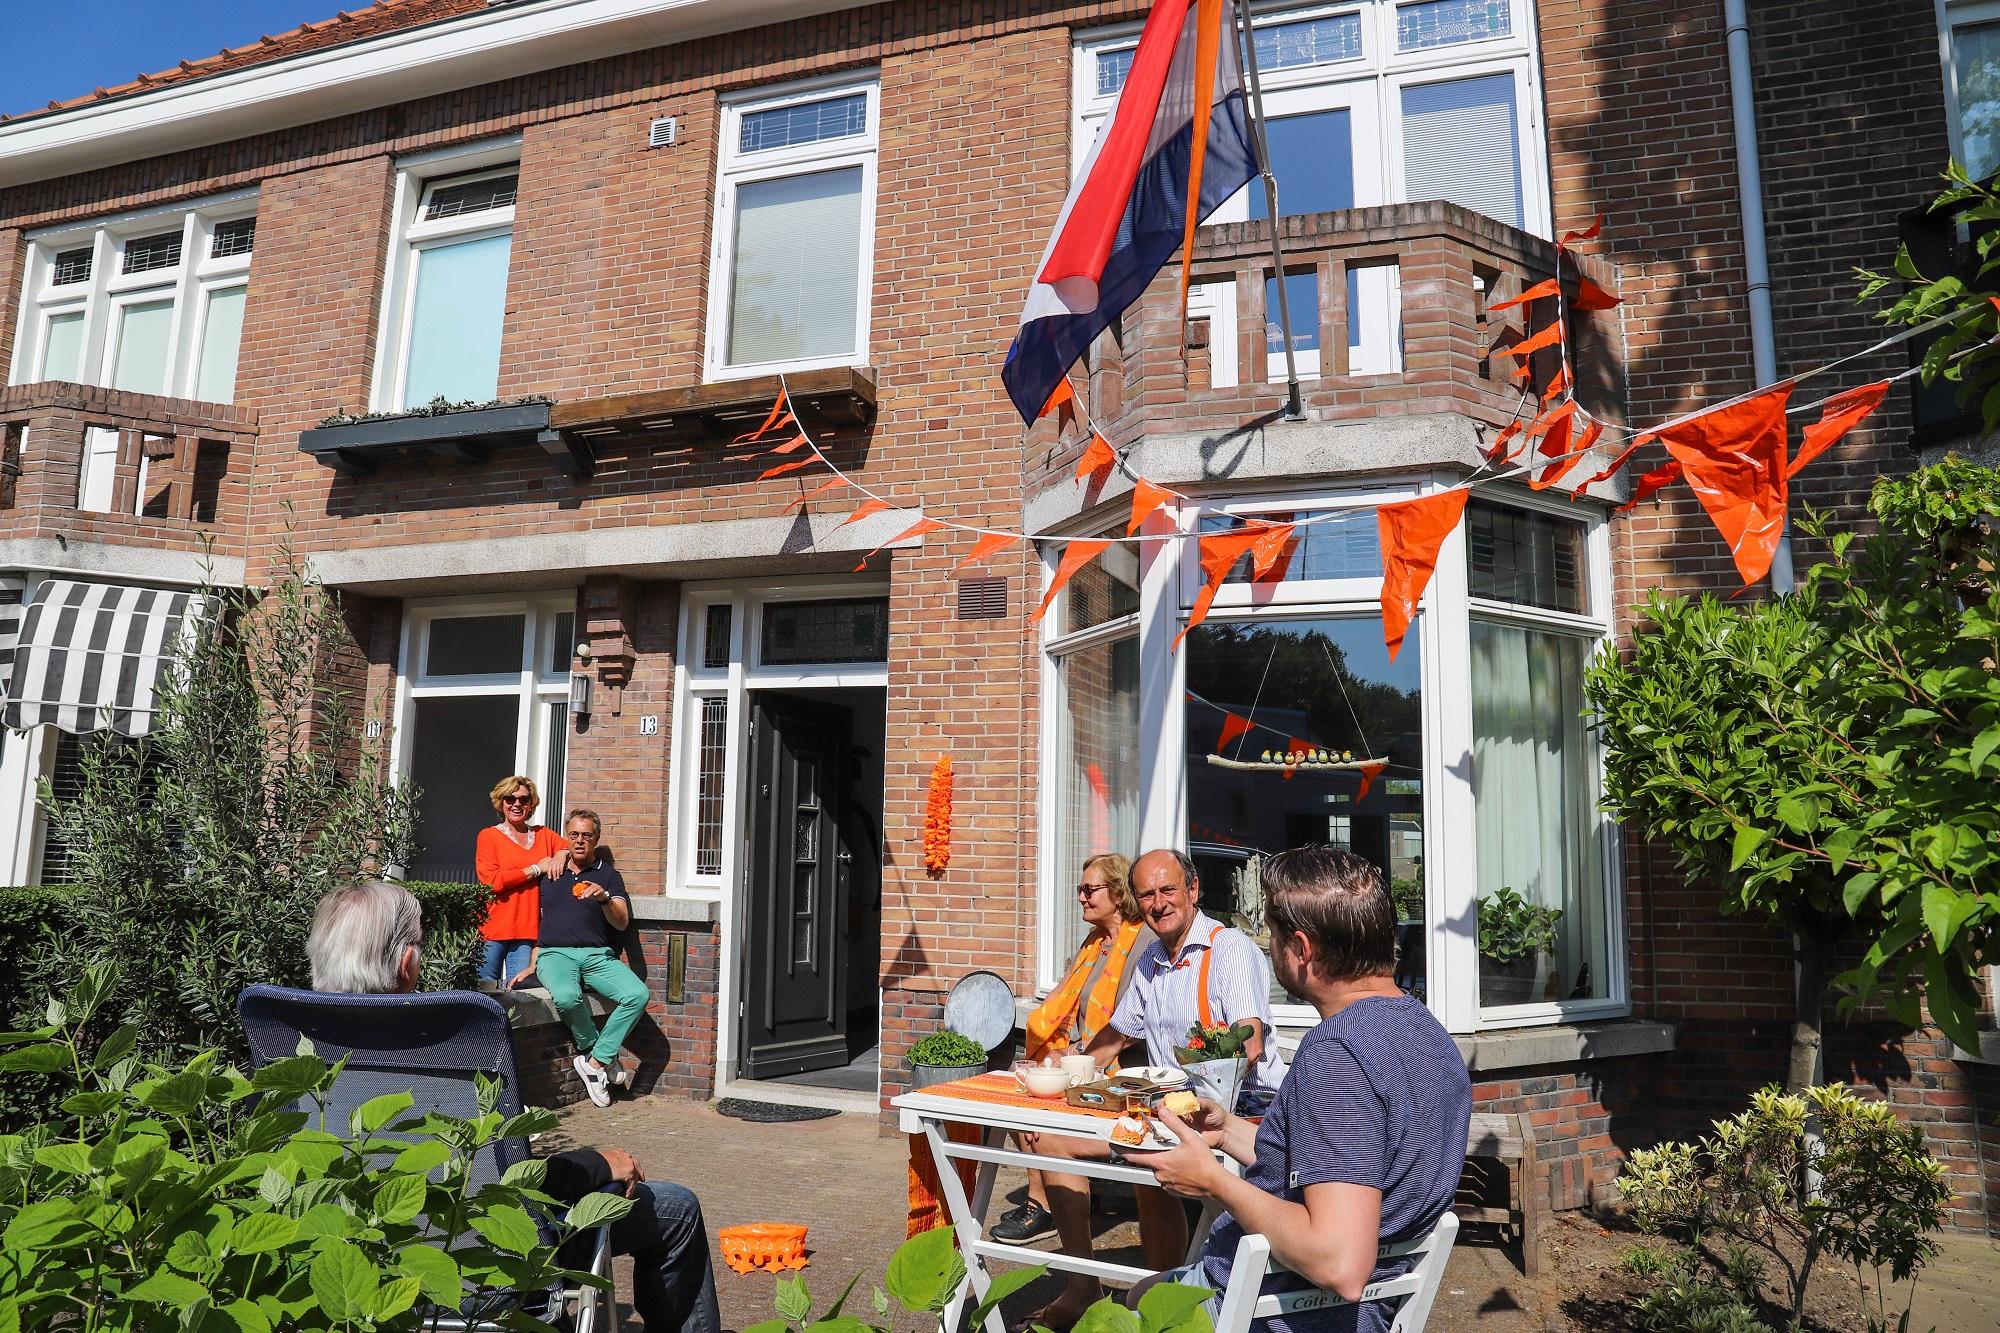 Koningsdag 2021 Bergen op Zoom woningsdag 2020 koningsdag 2020 nederlandse vlag nederland